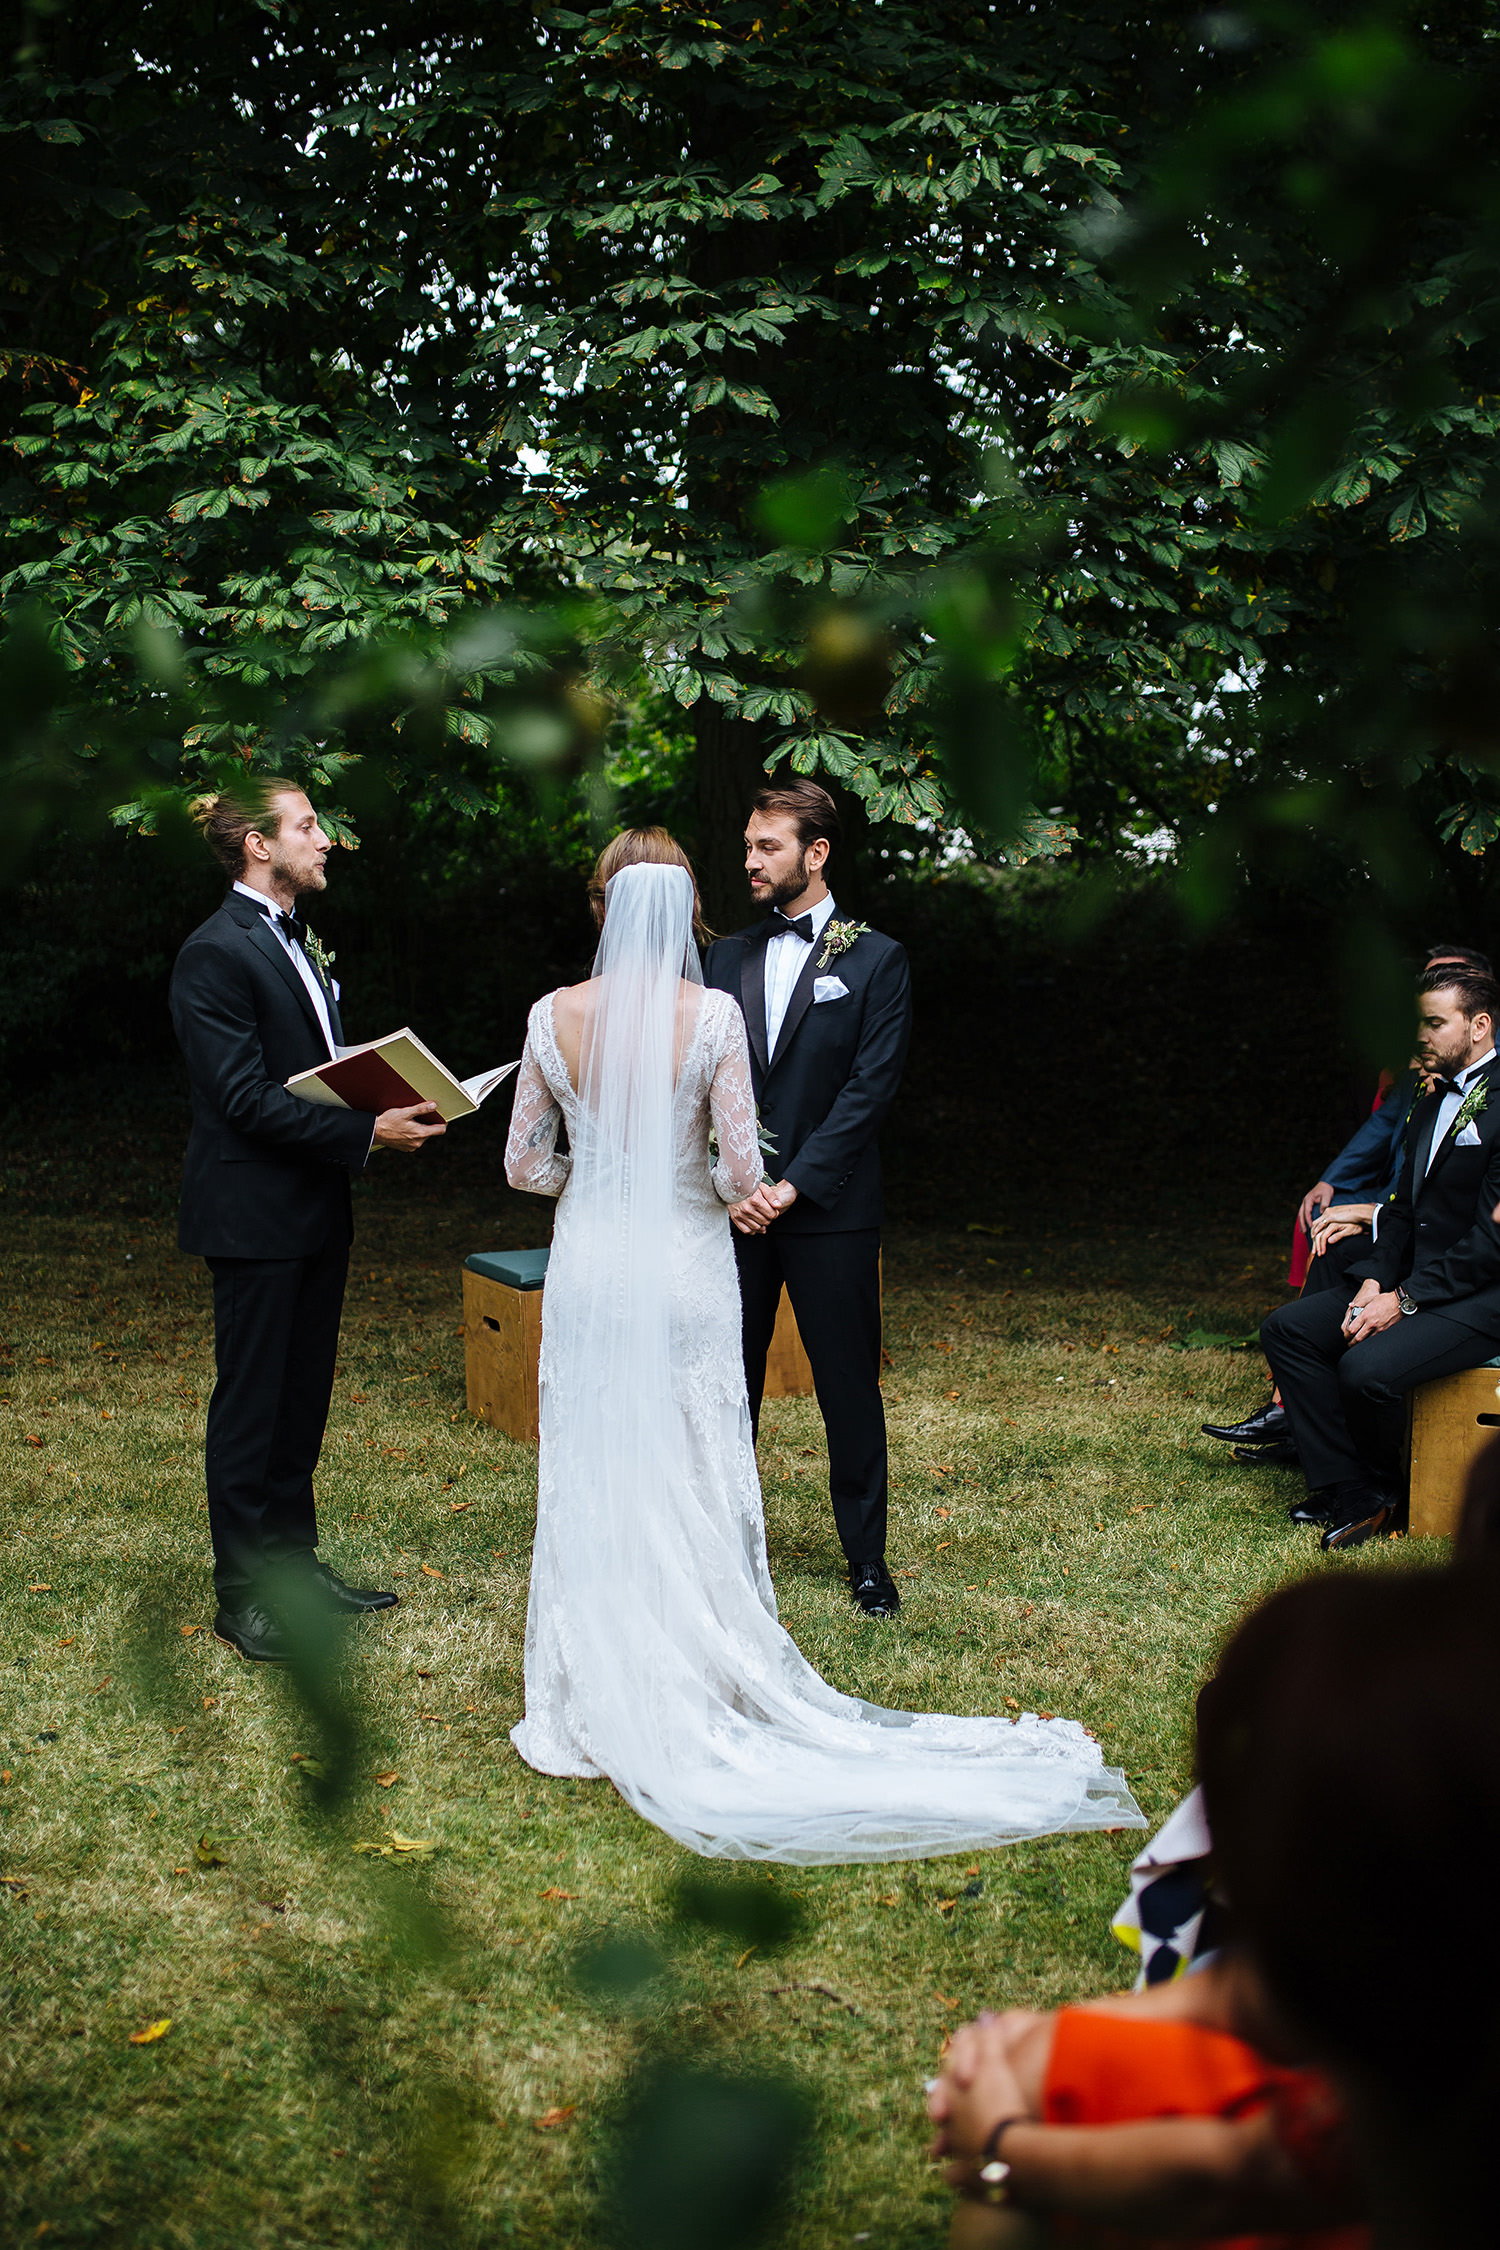 CHILDERLEY HALL WEDDING 8.jpg